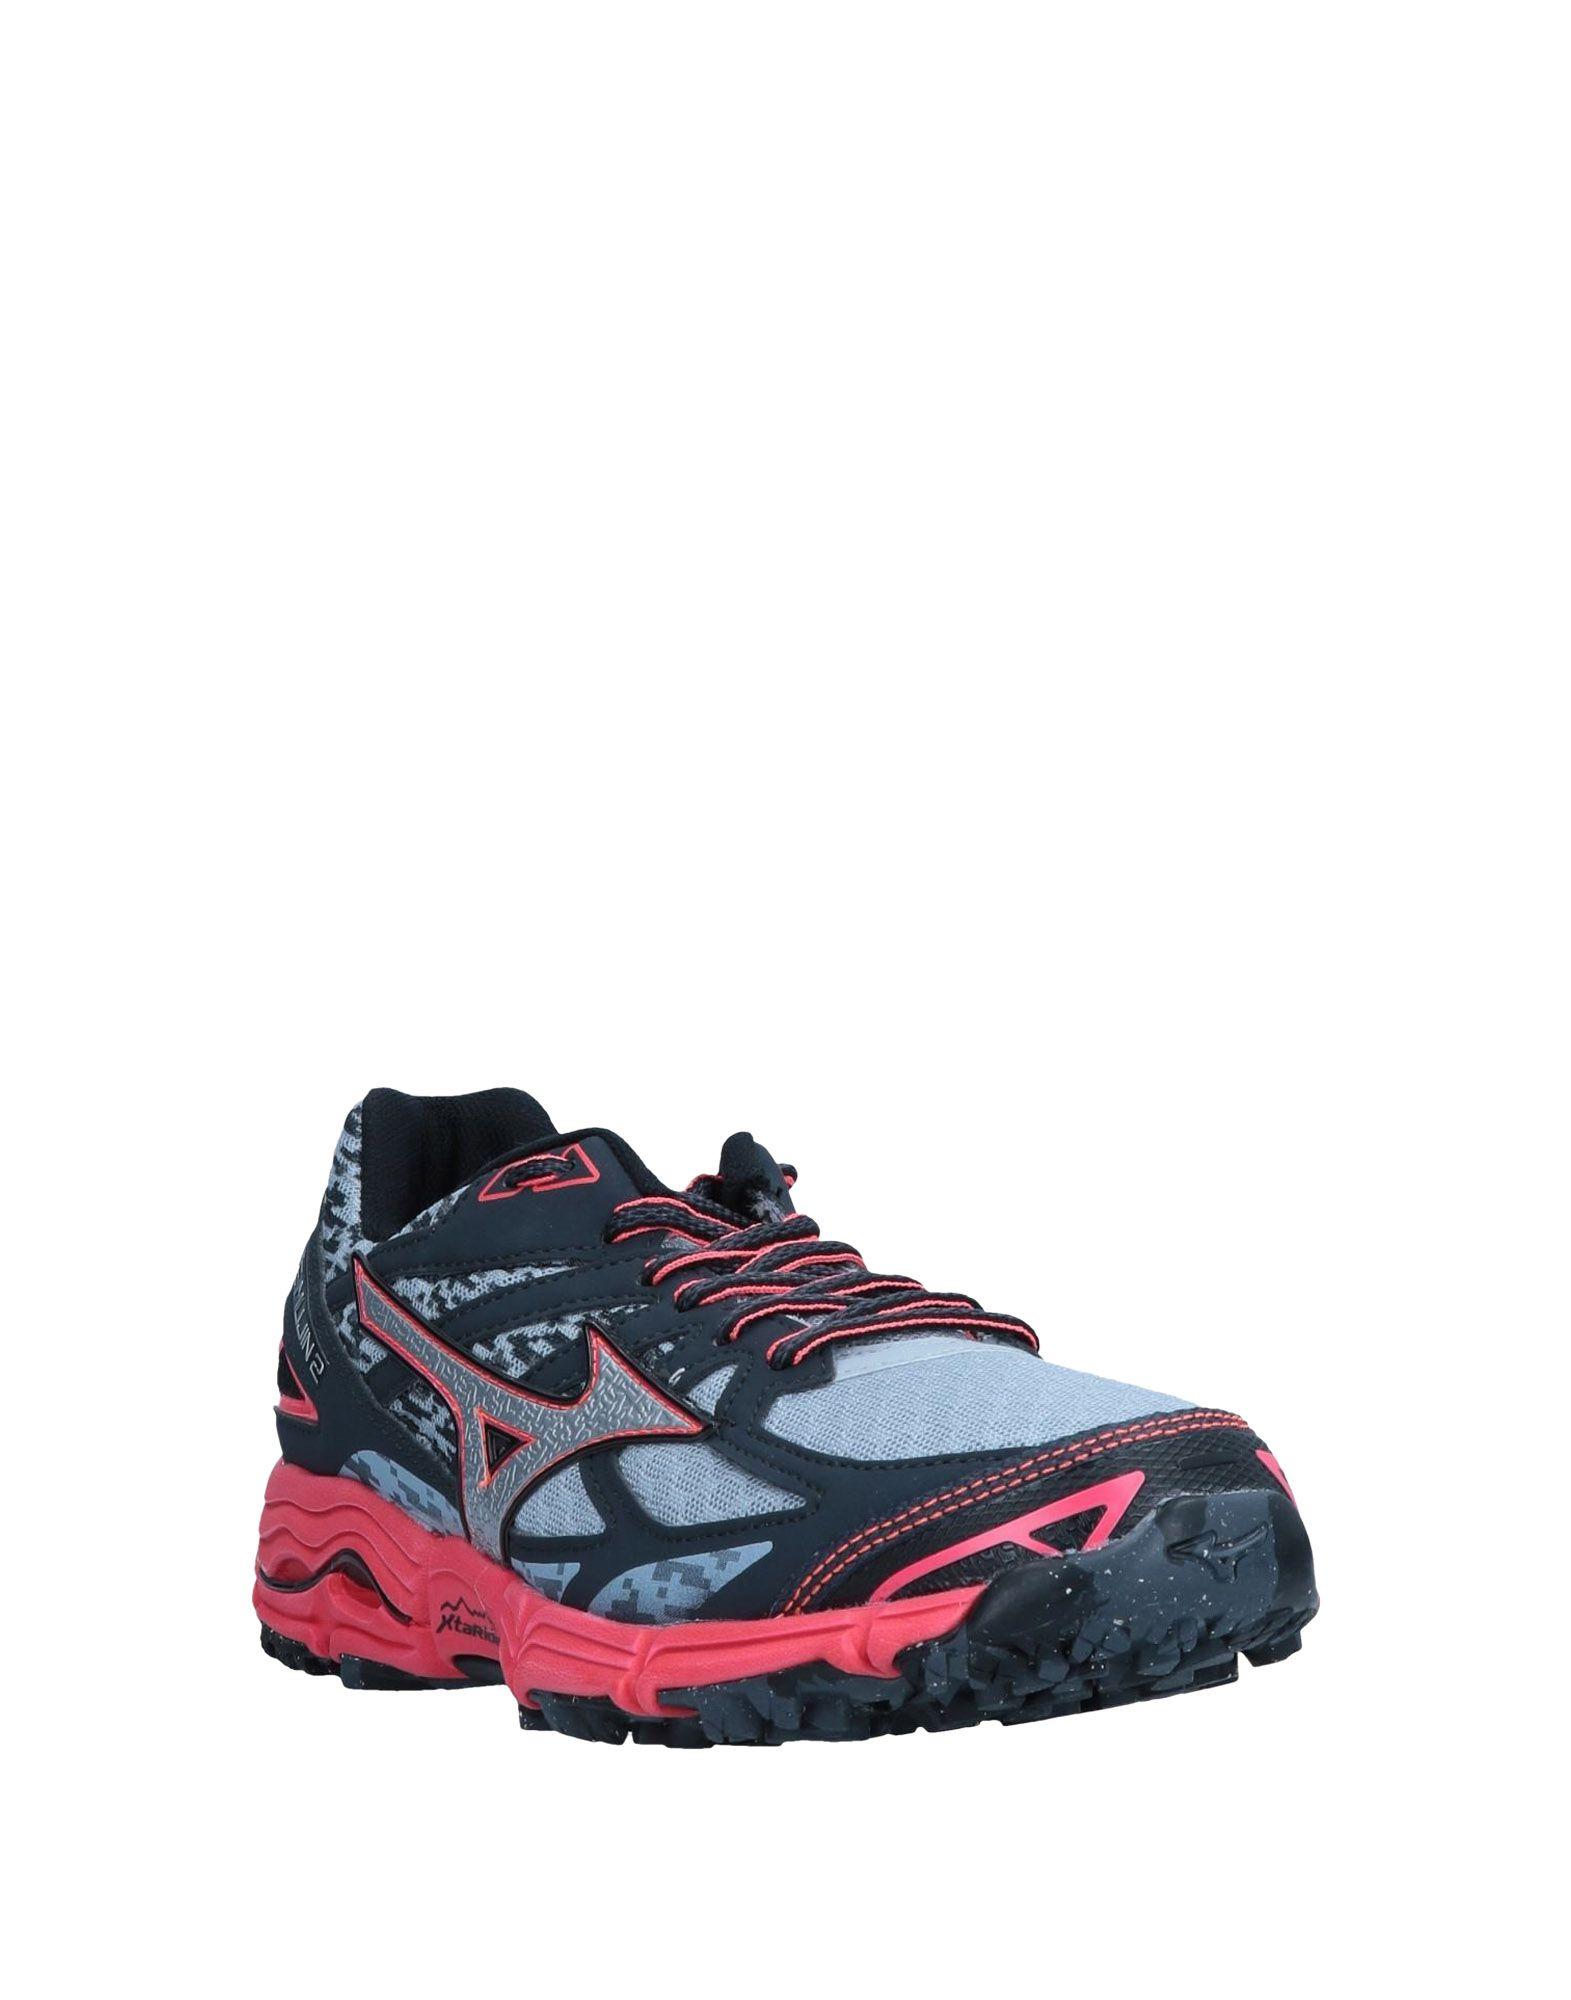 Mizuno Sneakers Damen  11546030WE Gute Qualität beliebte Schuhe